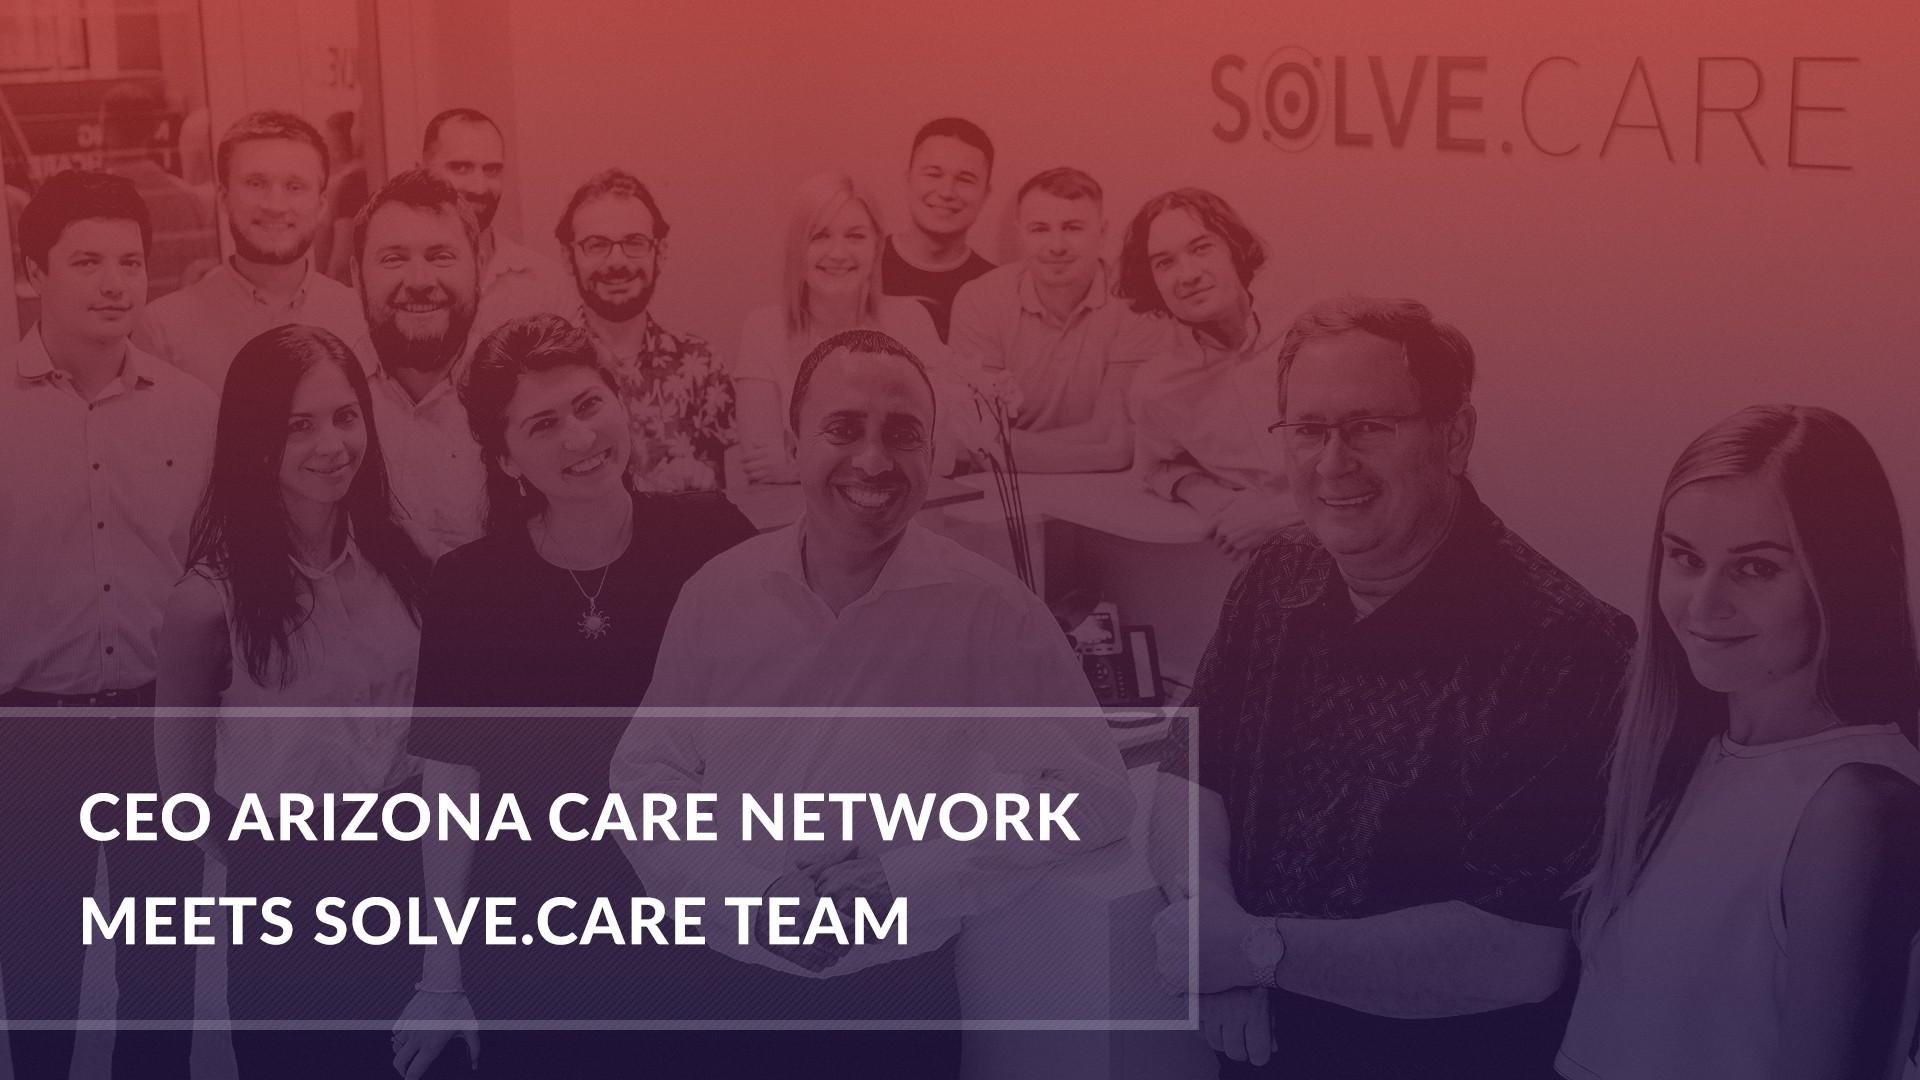 CEO Arizona Care Network meets Solve.Care team